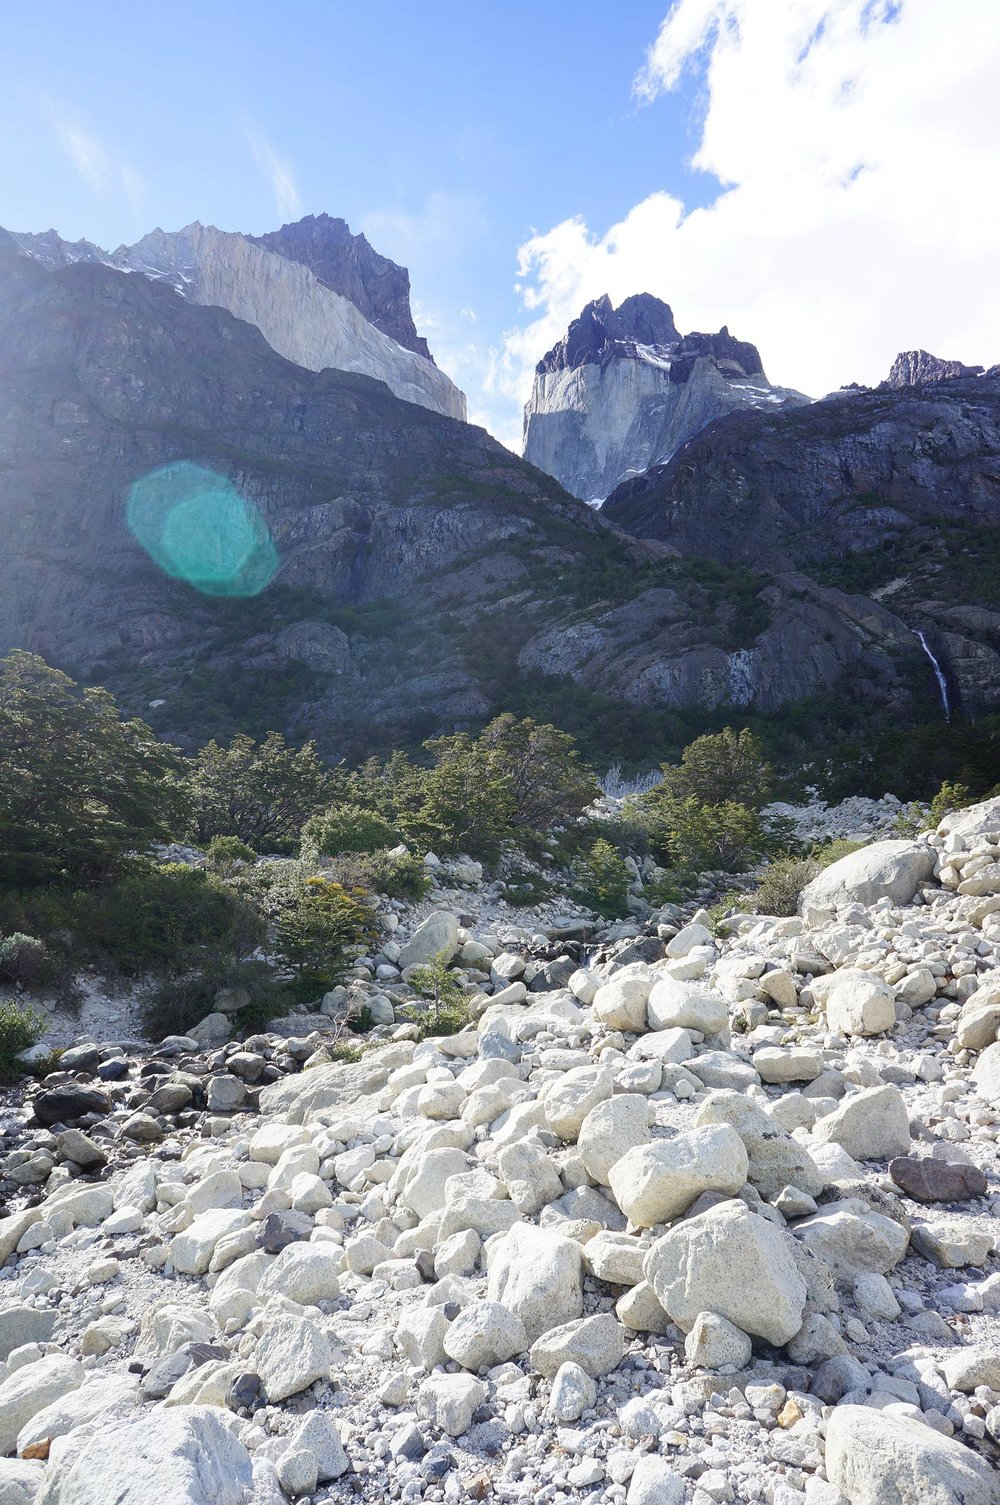 torres_del_paine_w_trek_mountains.jpg